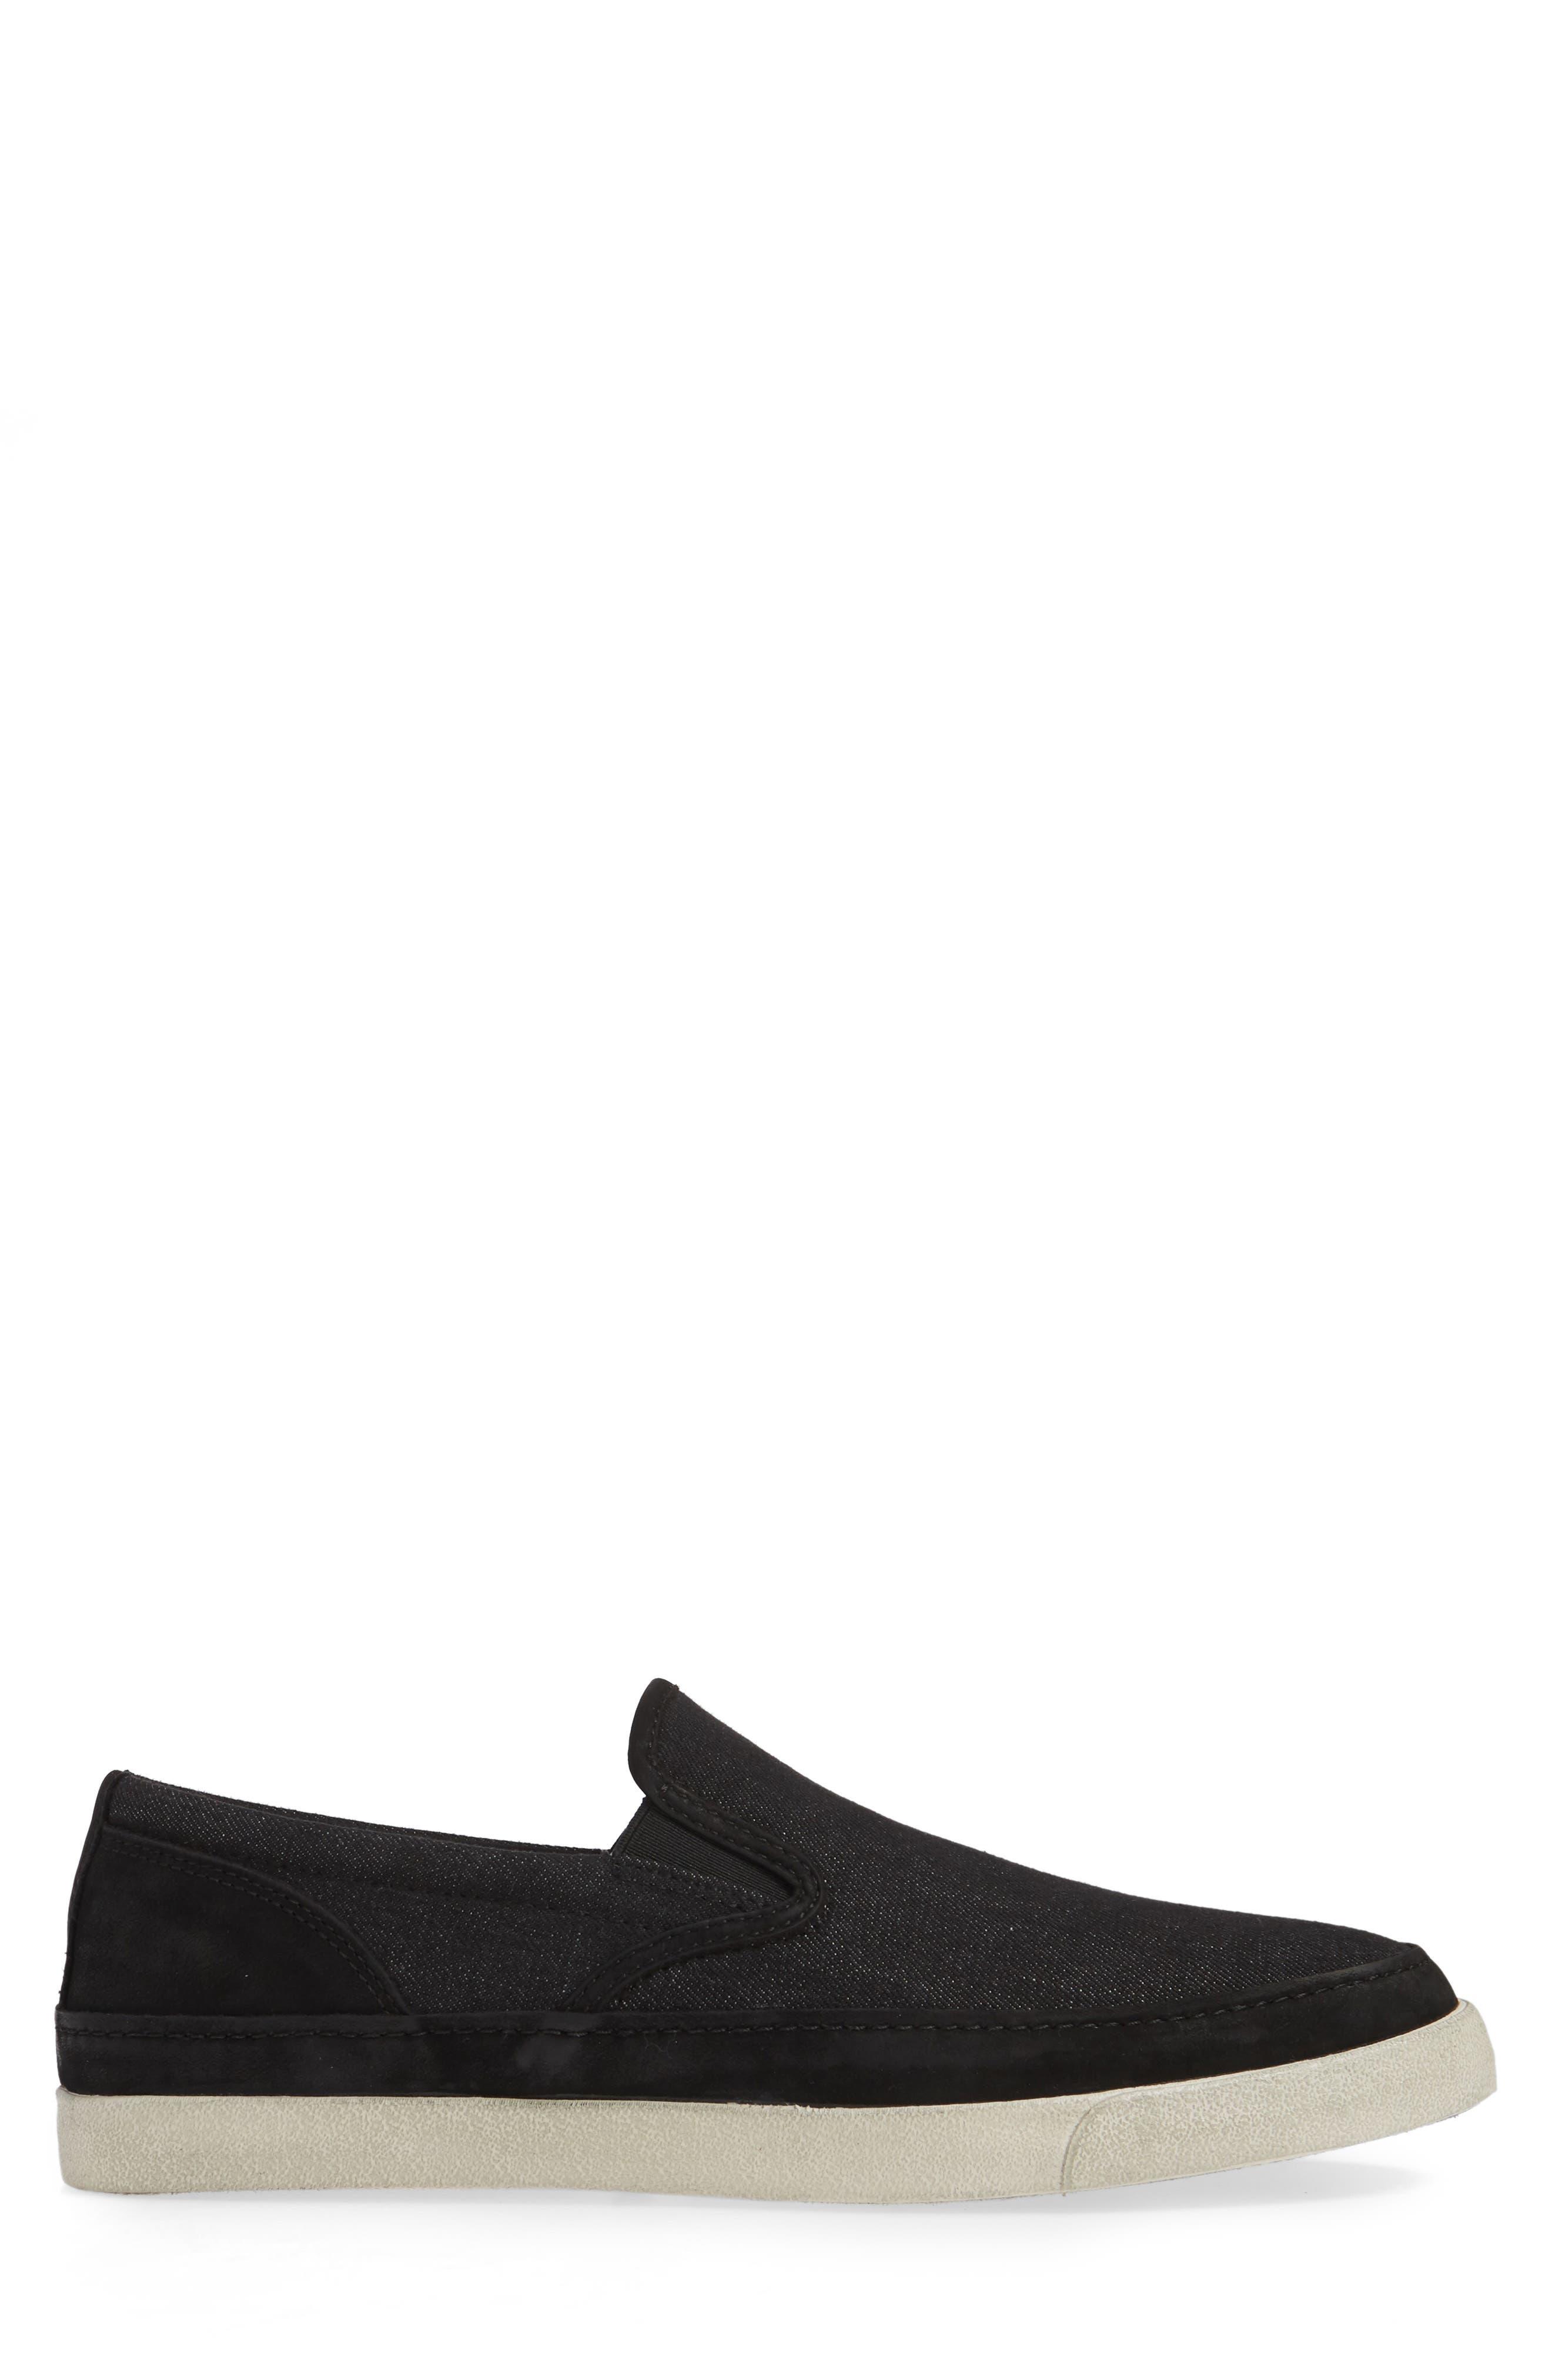 ,                             Jet Canvas Slip-On Sneaker,                             Alternate thumbnail 3, color,                             MINERAL BLK